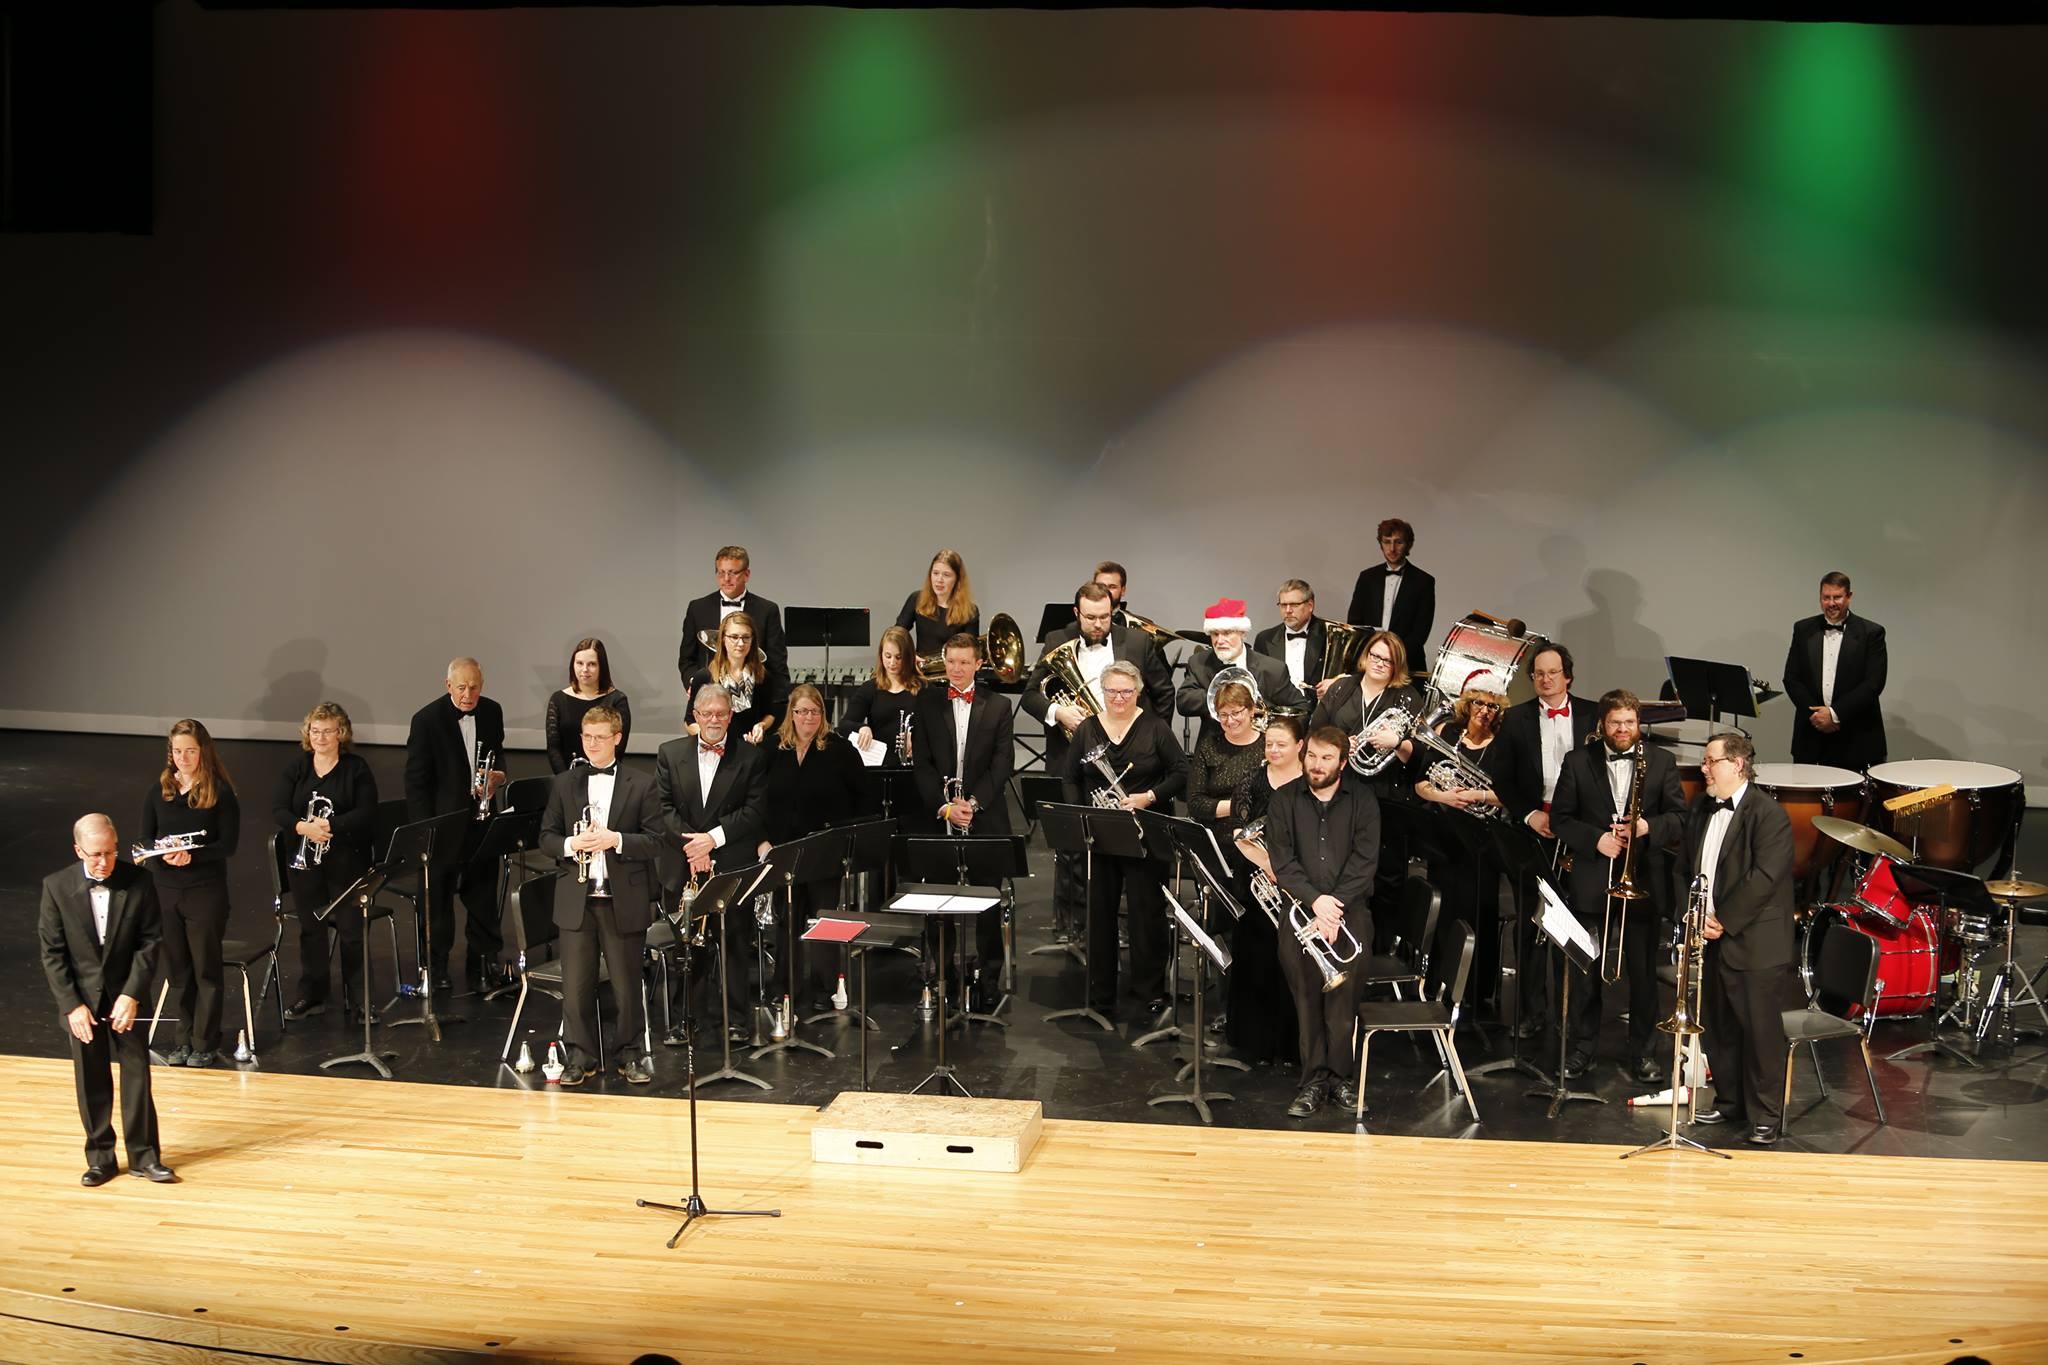 christmas, brass, band, concert, winona, minnesota, instrument, performance